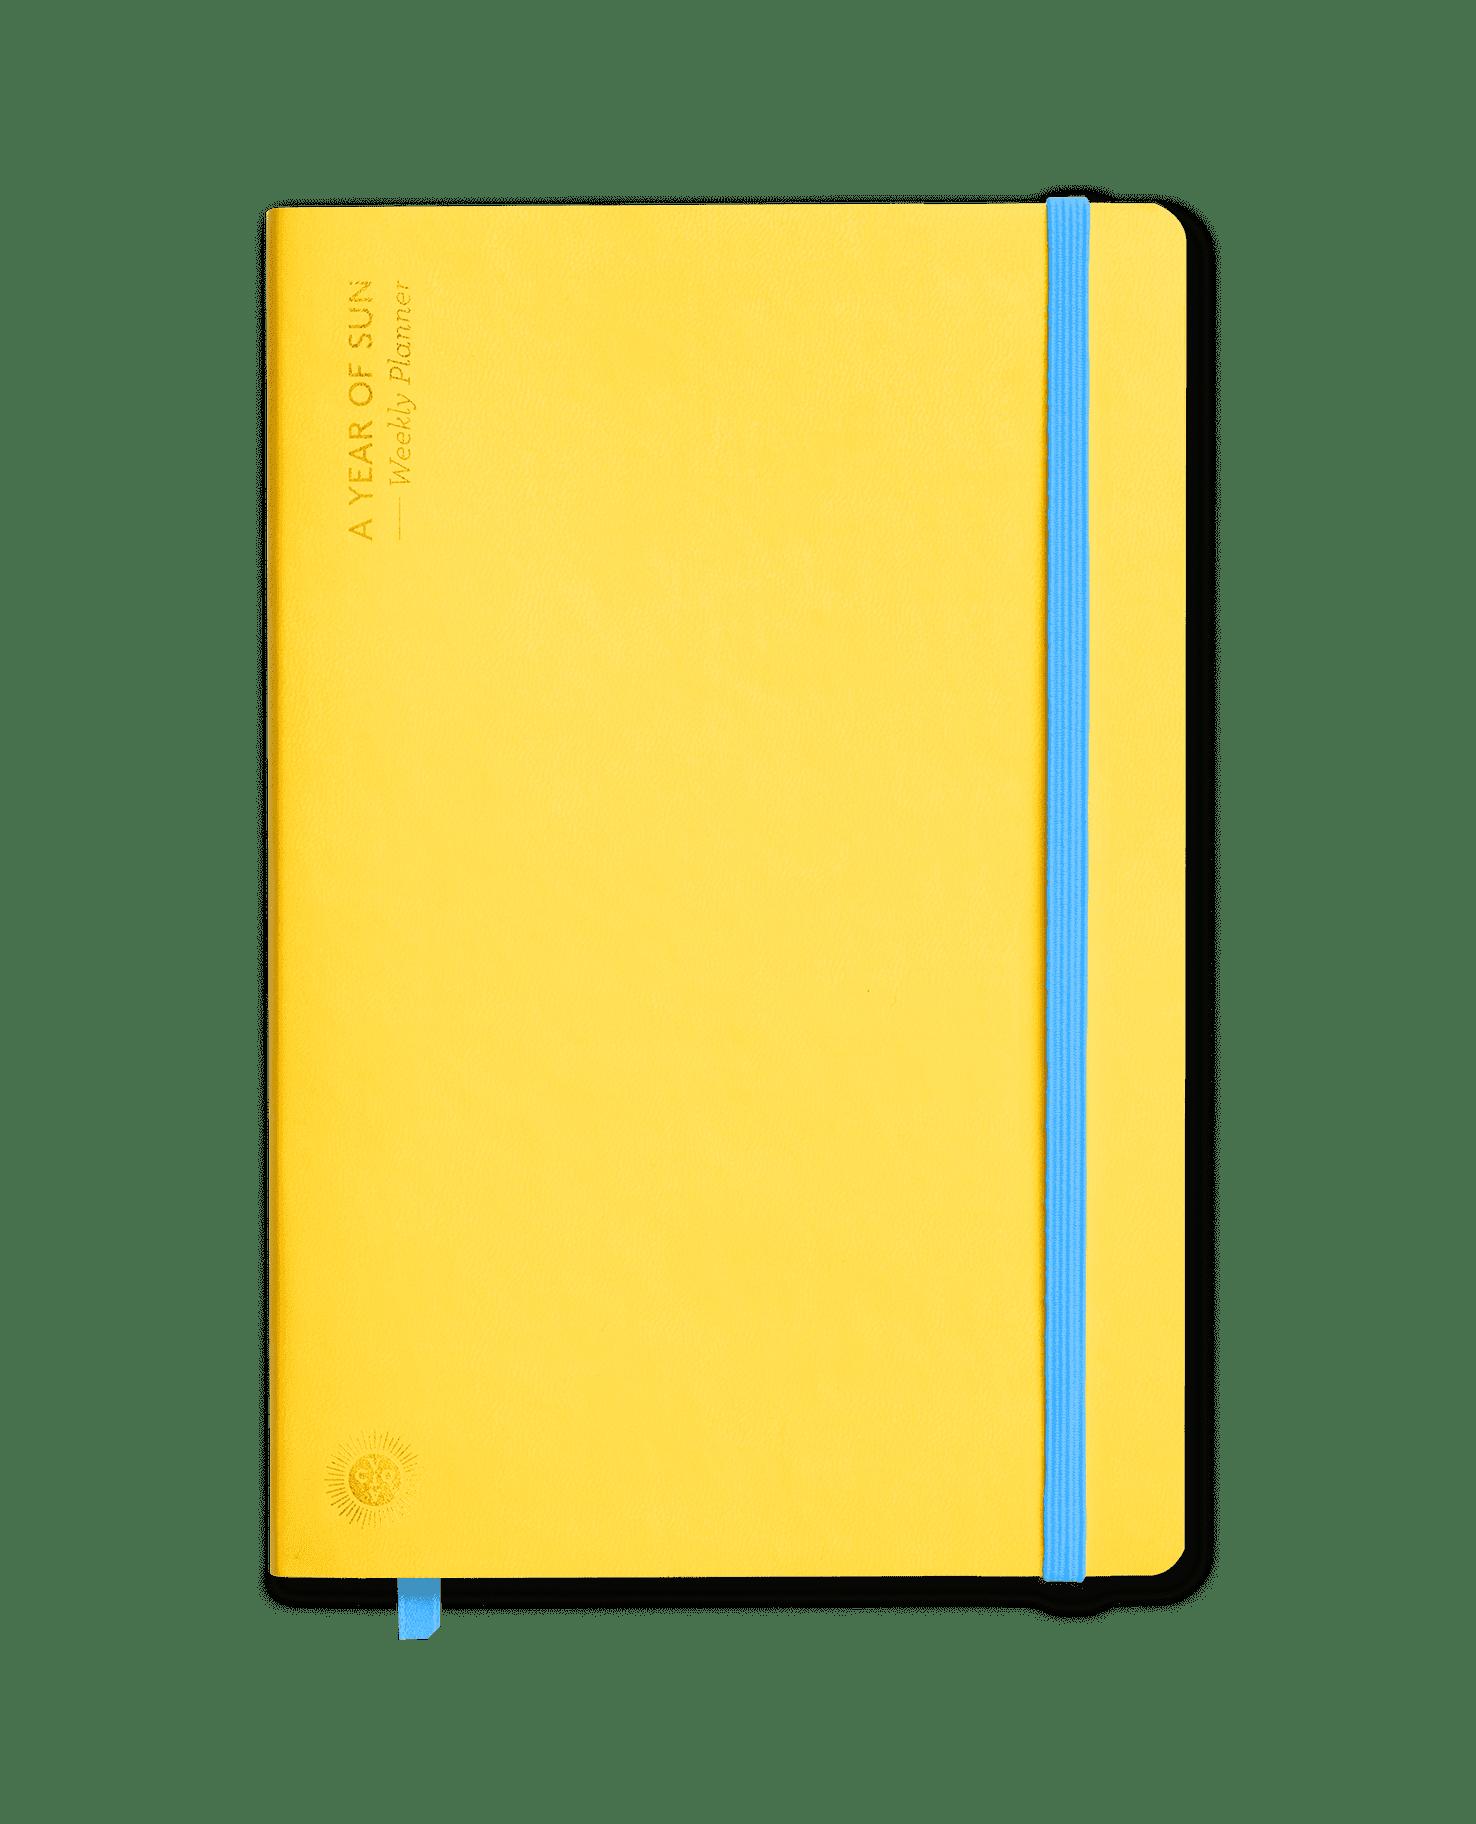 OAYBC-15 - Agenda A Year Of Sun